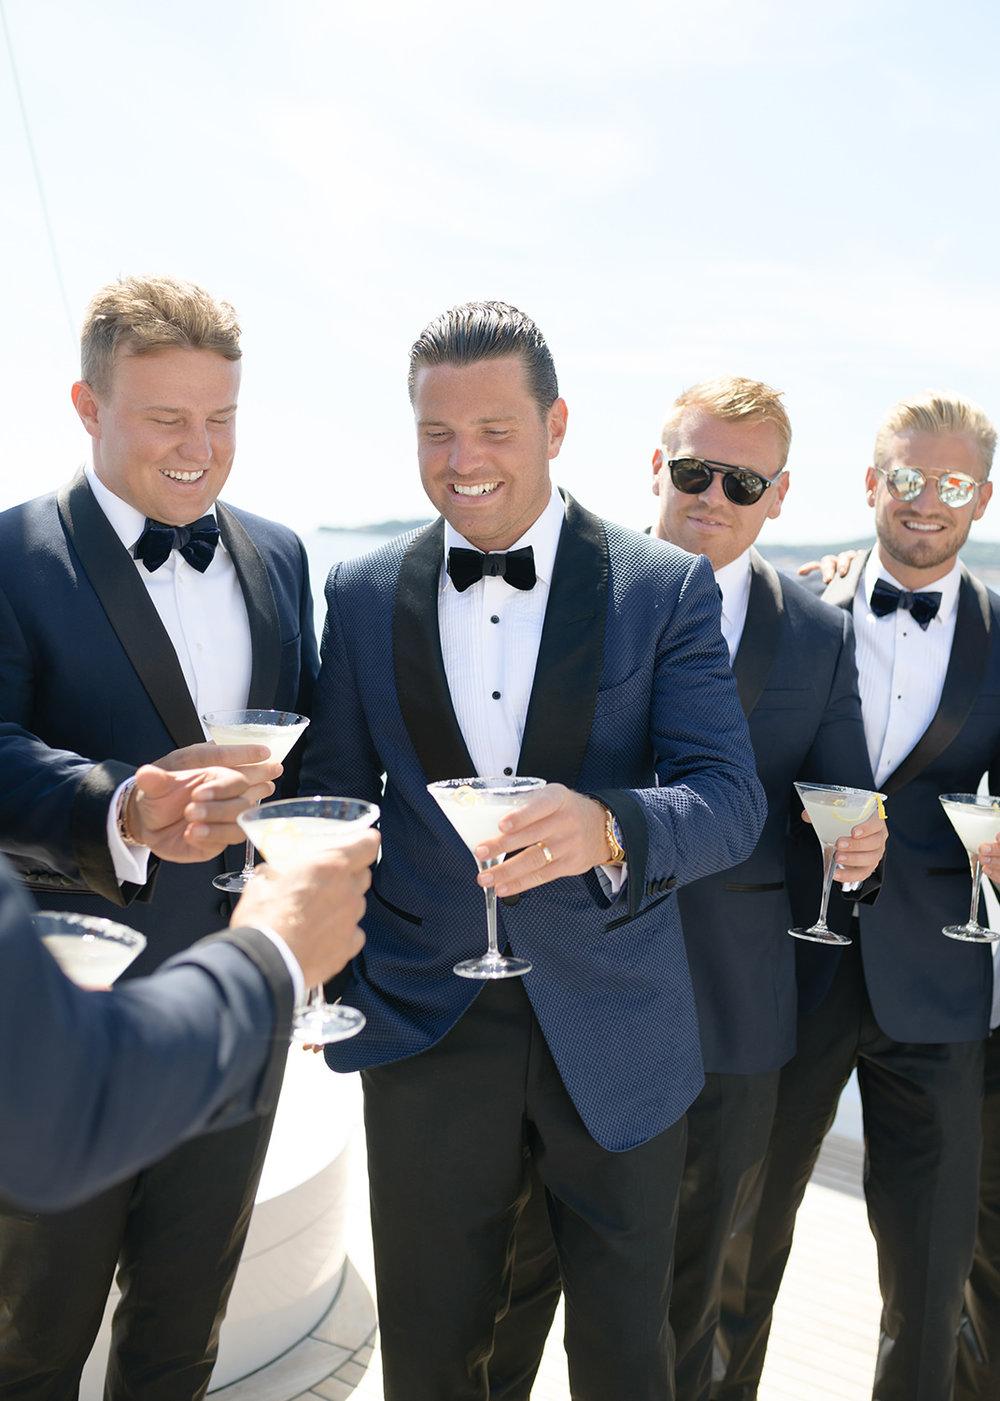 french riviera wedding photographer-F&D-©bottega53-16.JPG